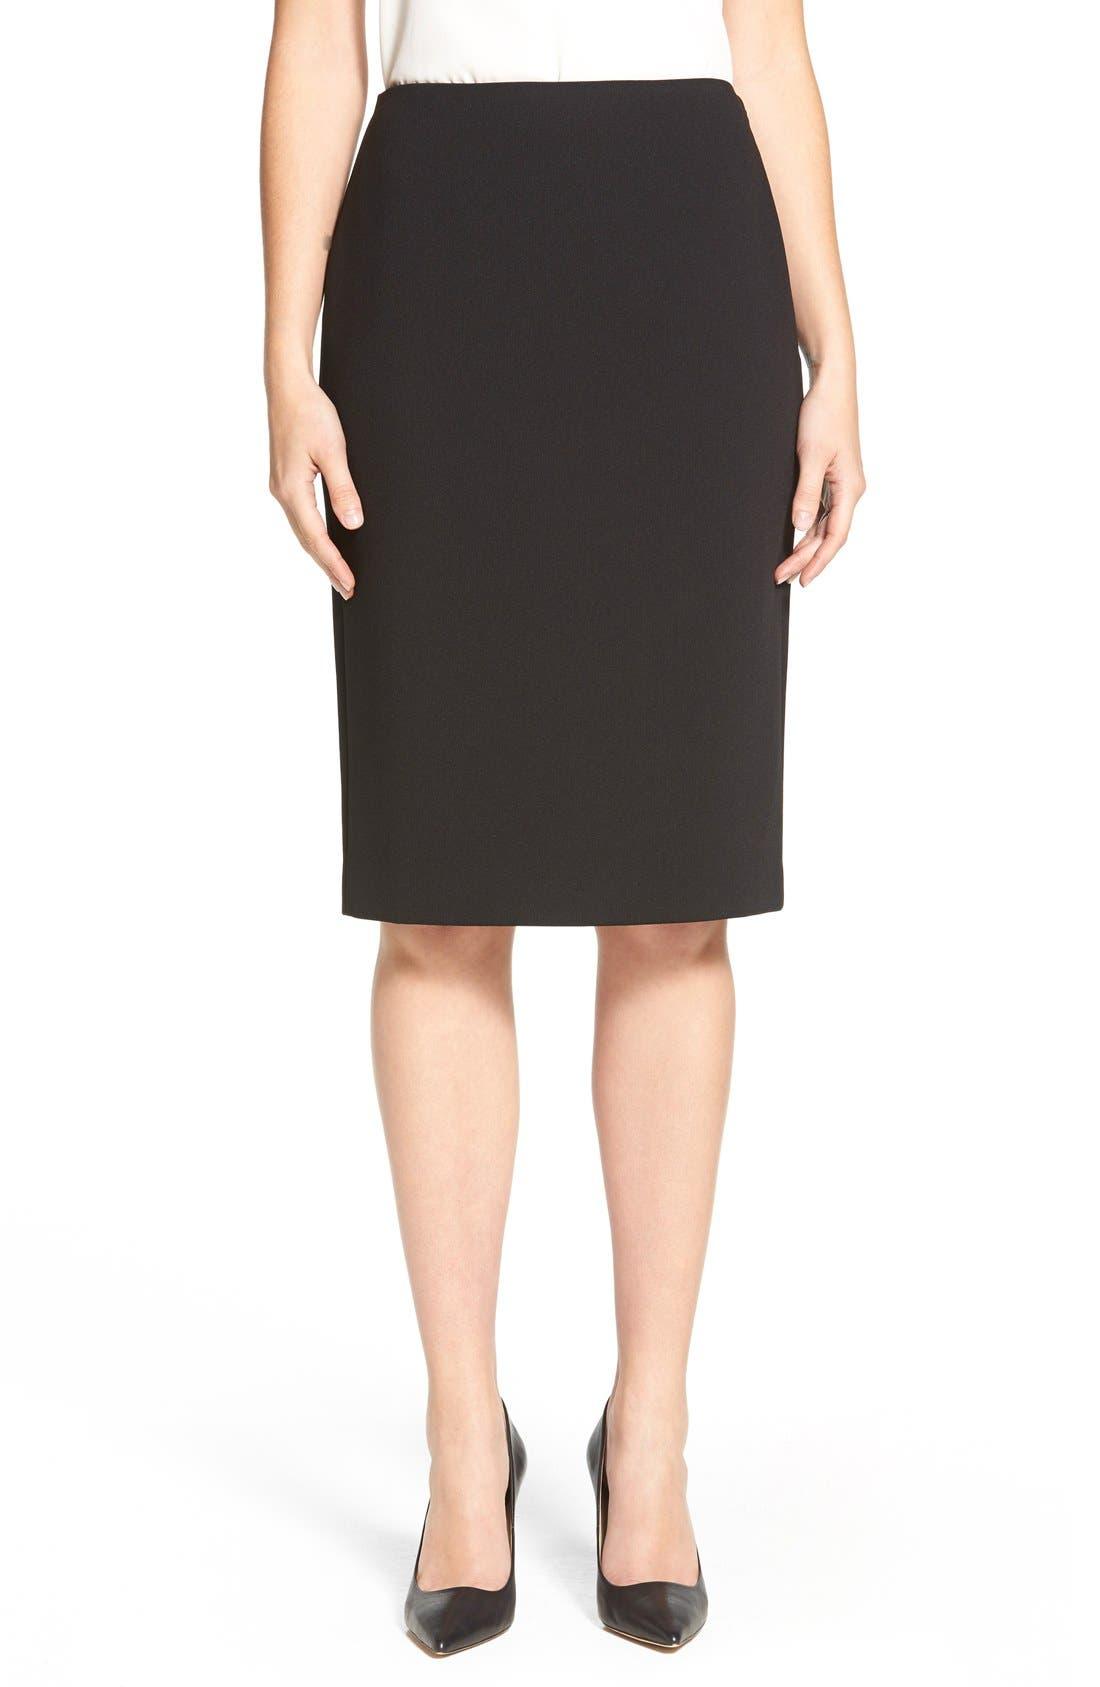 Alternate Image 1 Selected - Classiques Entier® Zip Back Ponte Pencil Skirt